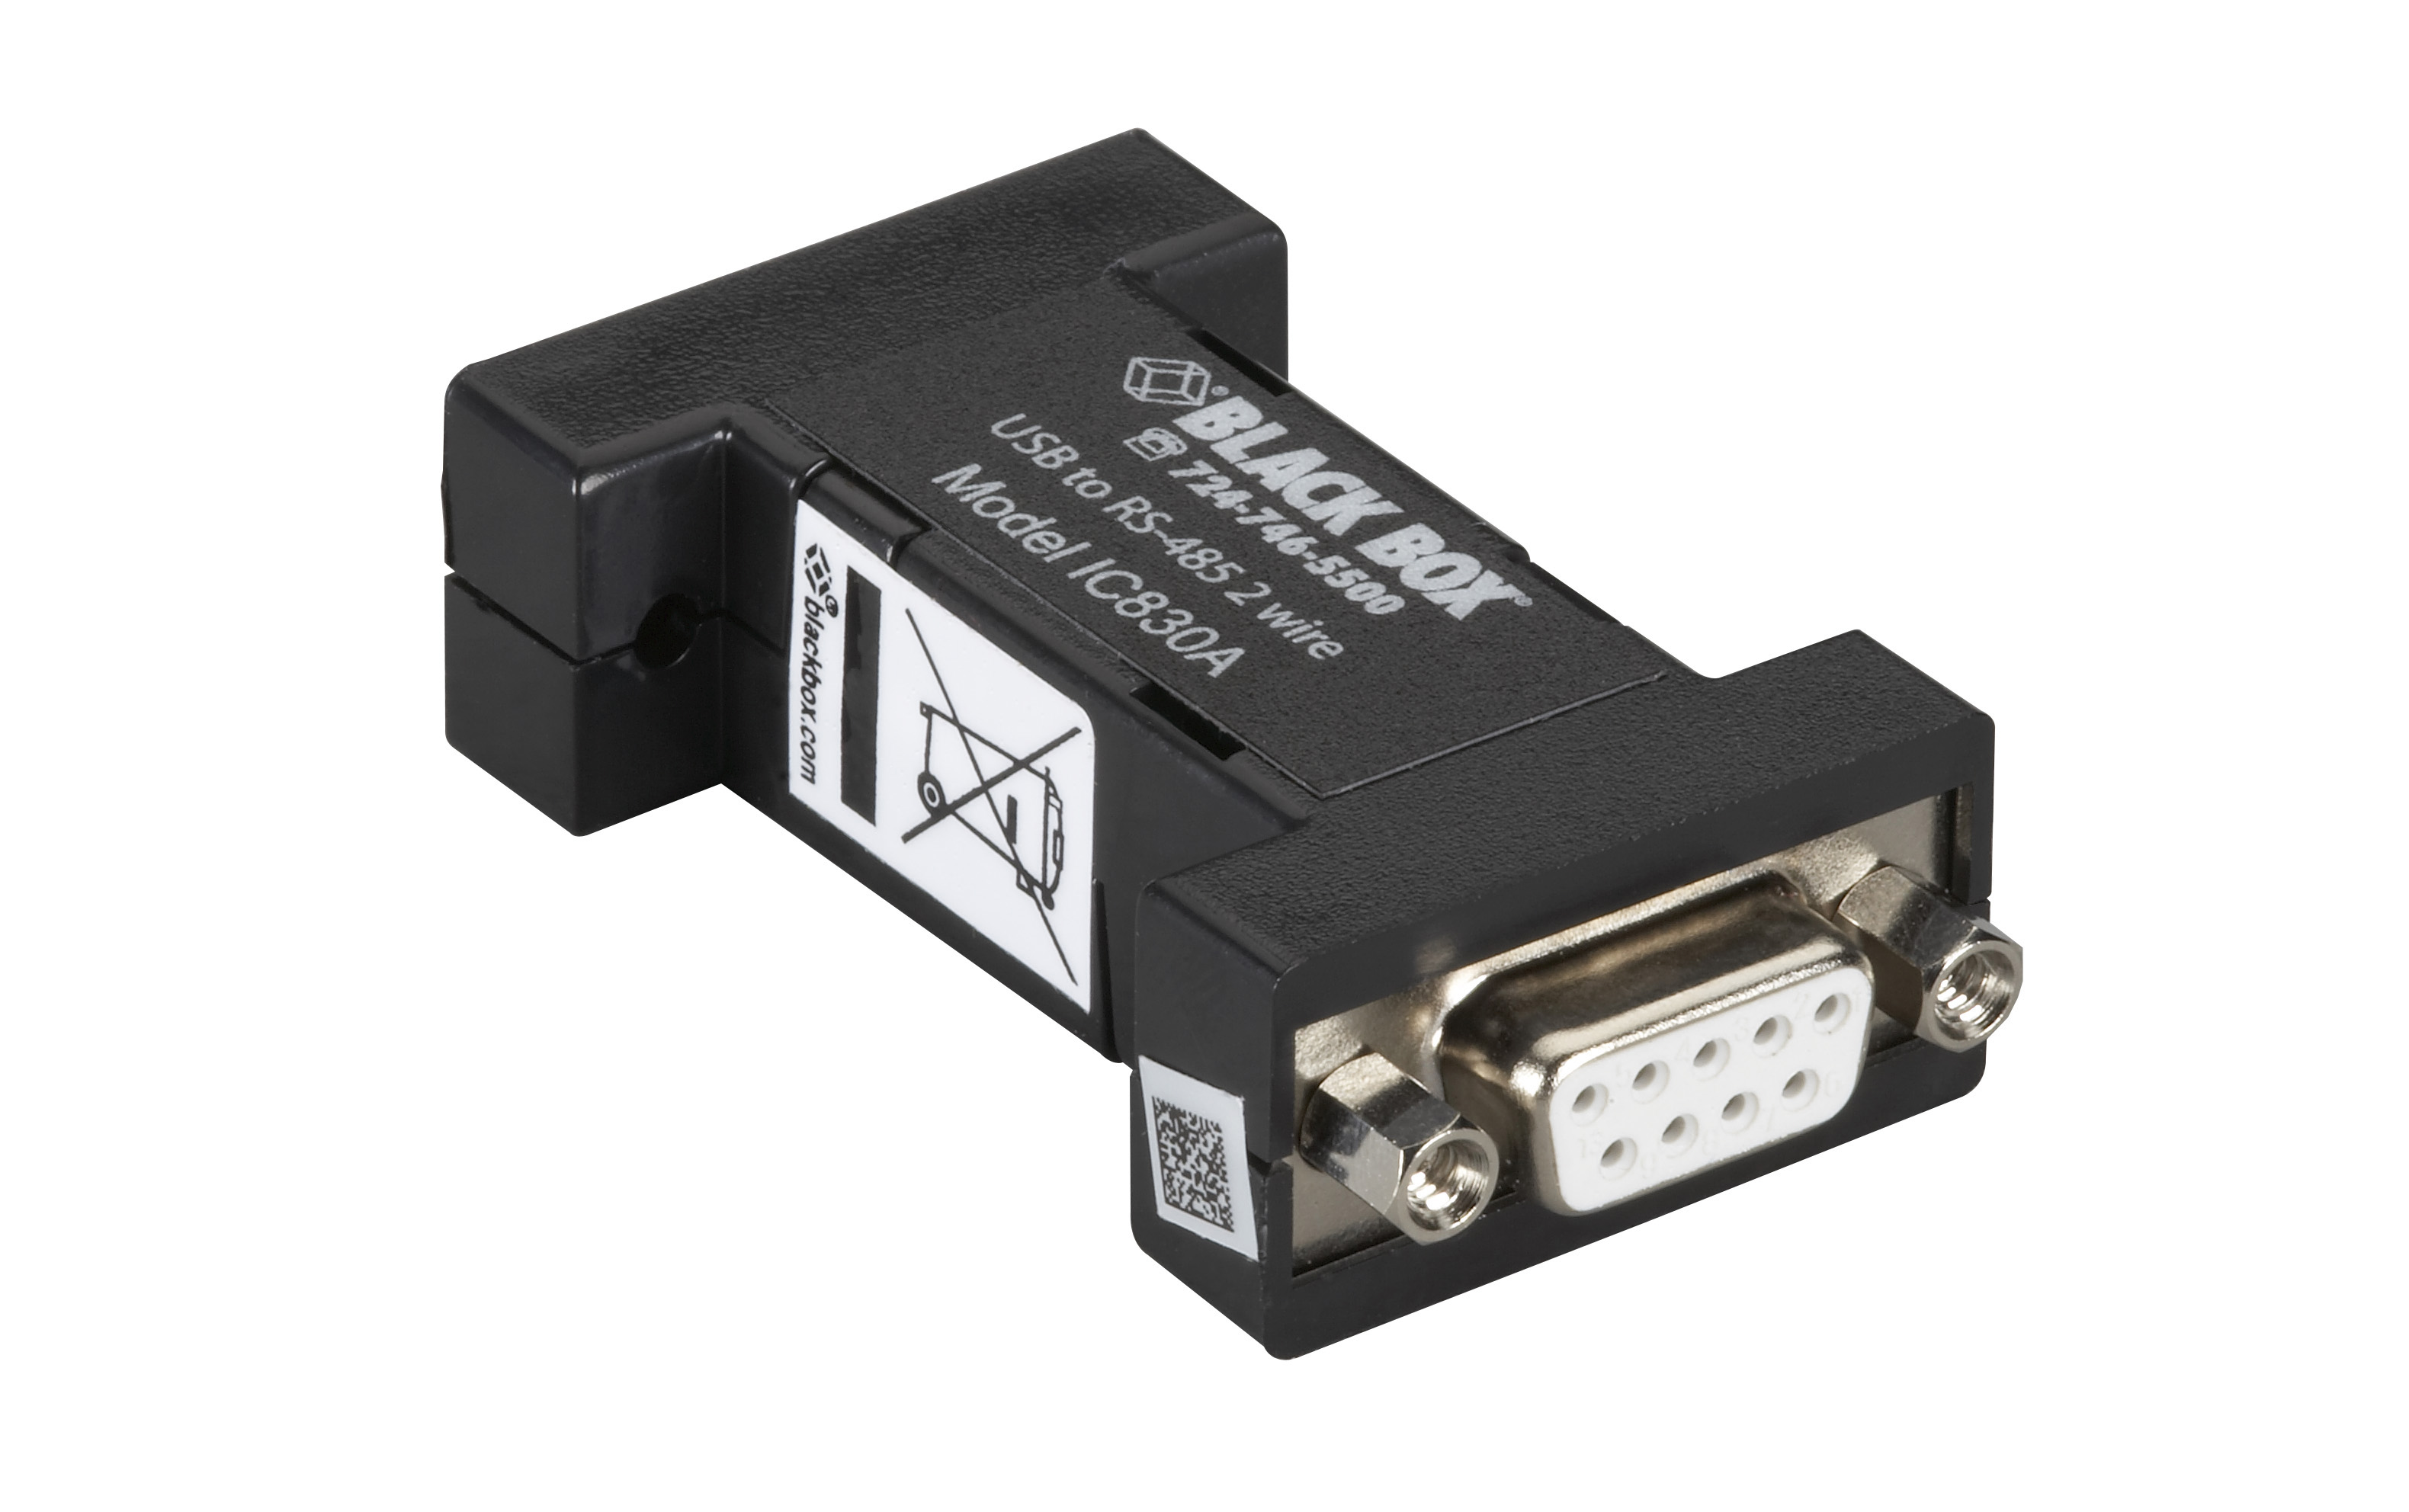 rs485 wiring travel trailer v front usb 2 2wire mini converter db9 black box